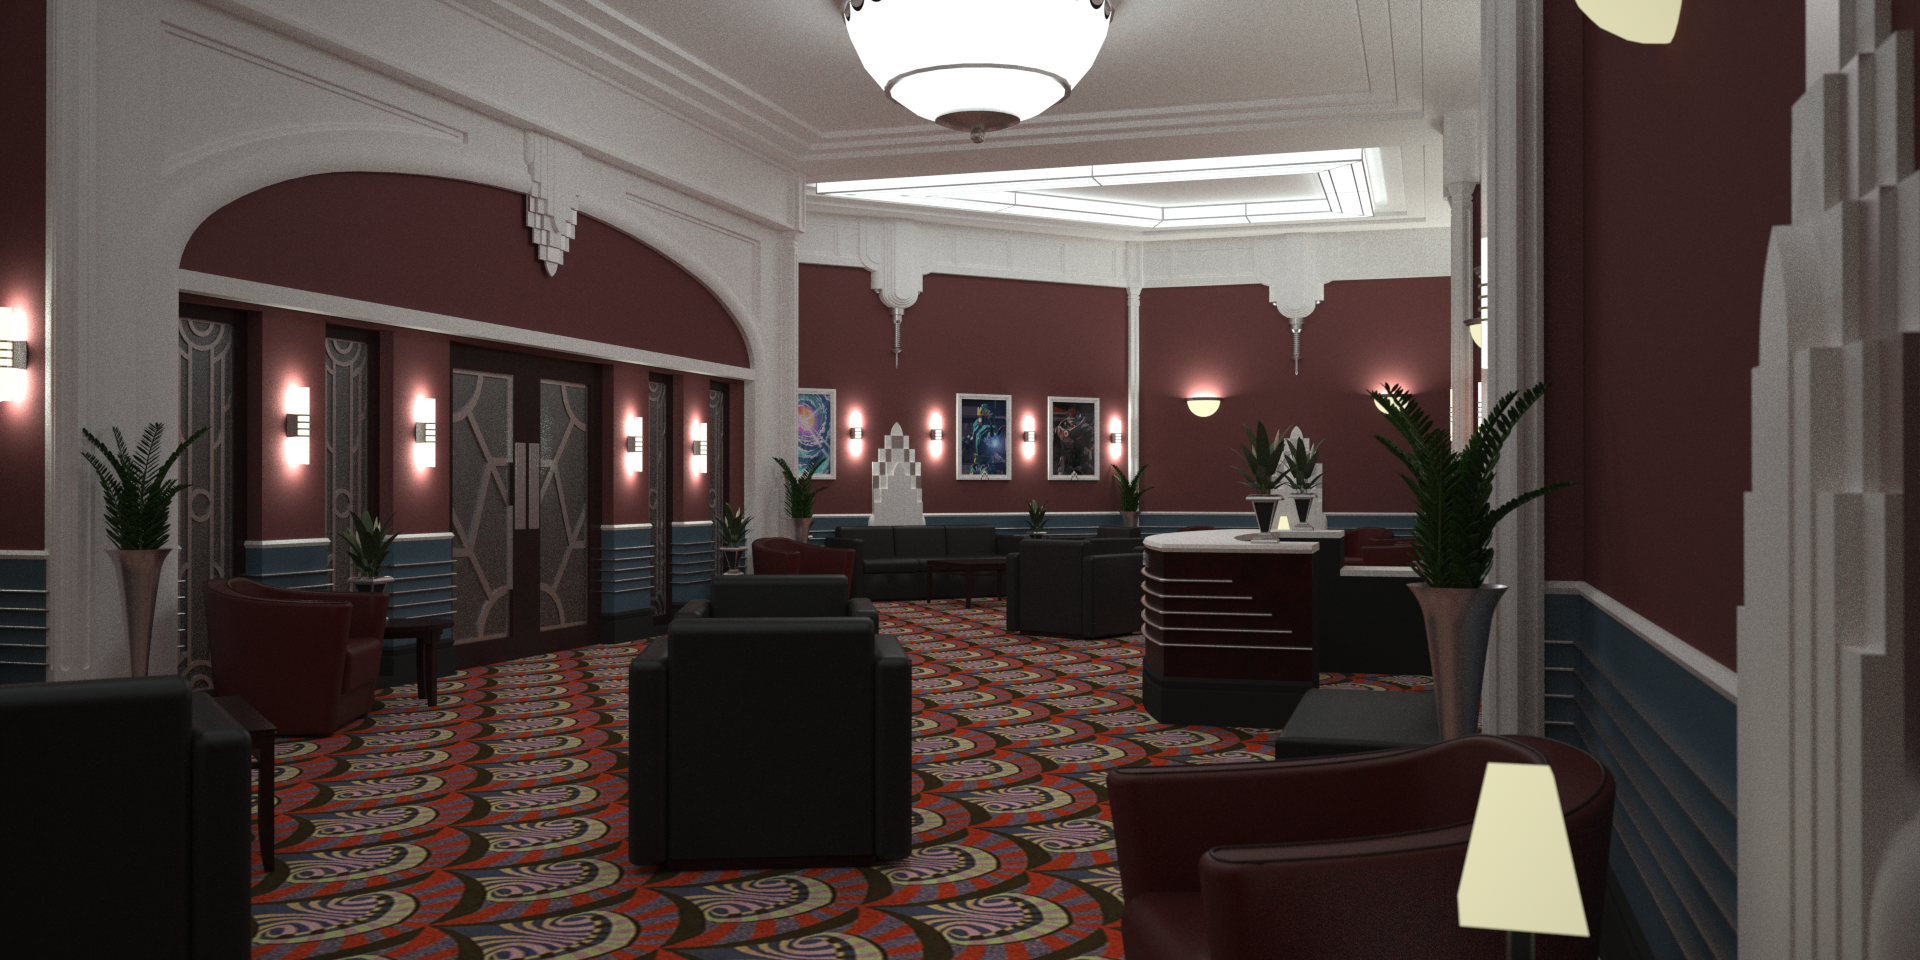 WANDA-Qingdao VIP Lounge V1_2 View 04 (MAXWELL).png